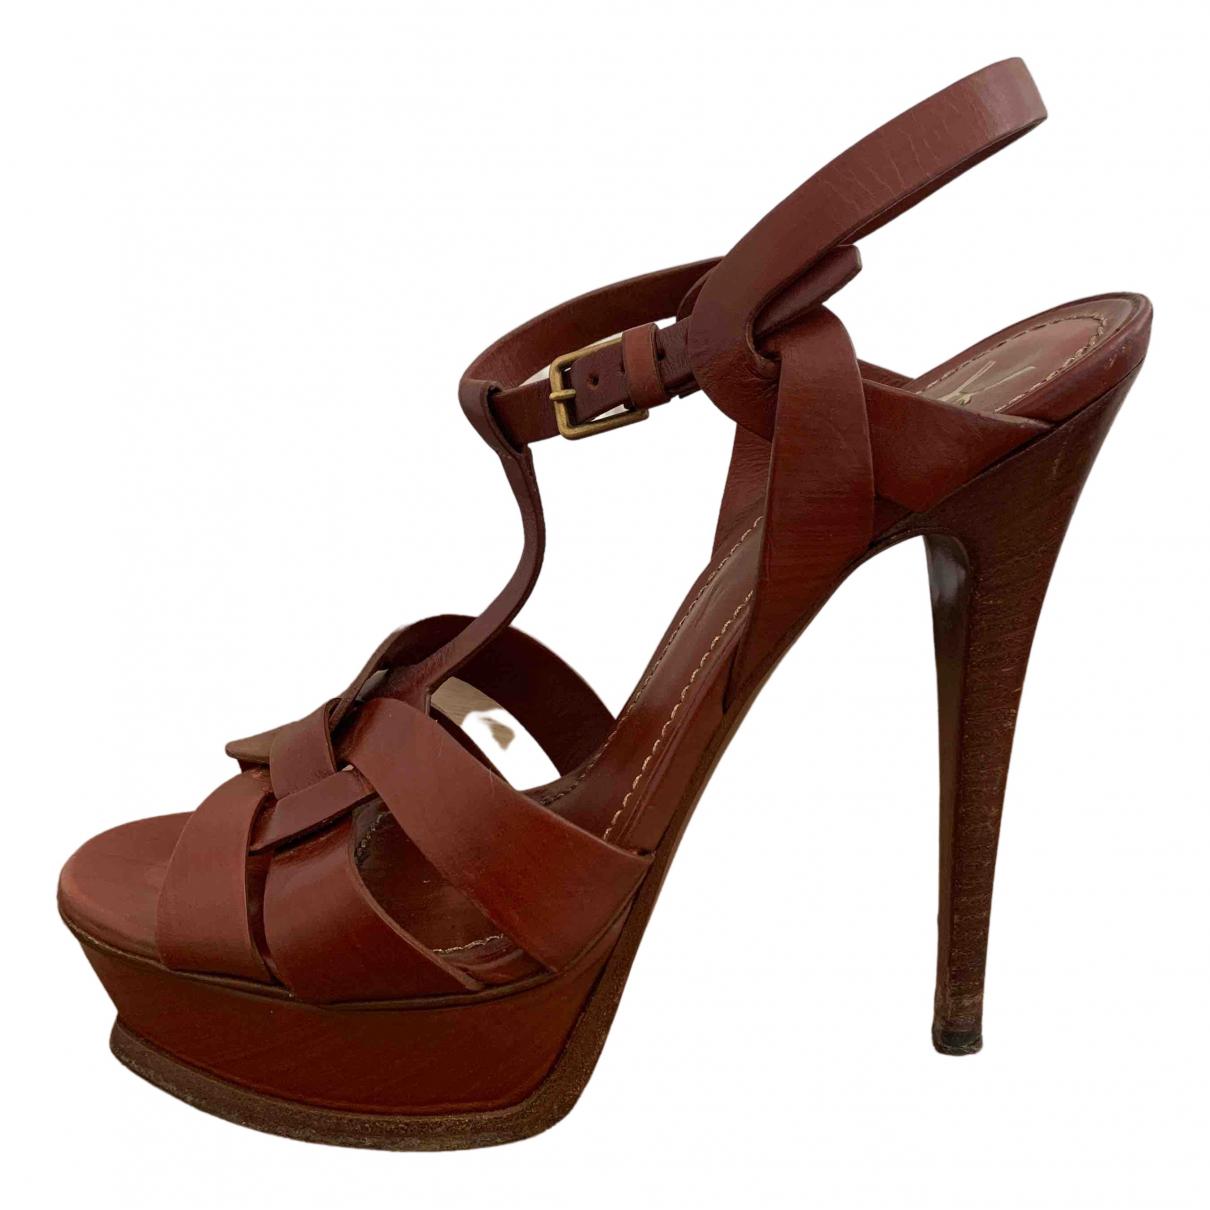 Yves Saint Laurent Tribute Brown Leather Sandals for Women 38 EU